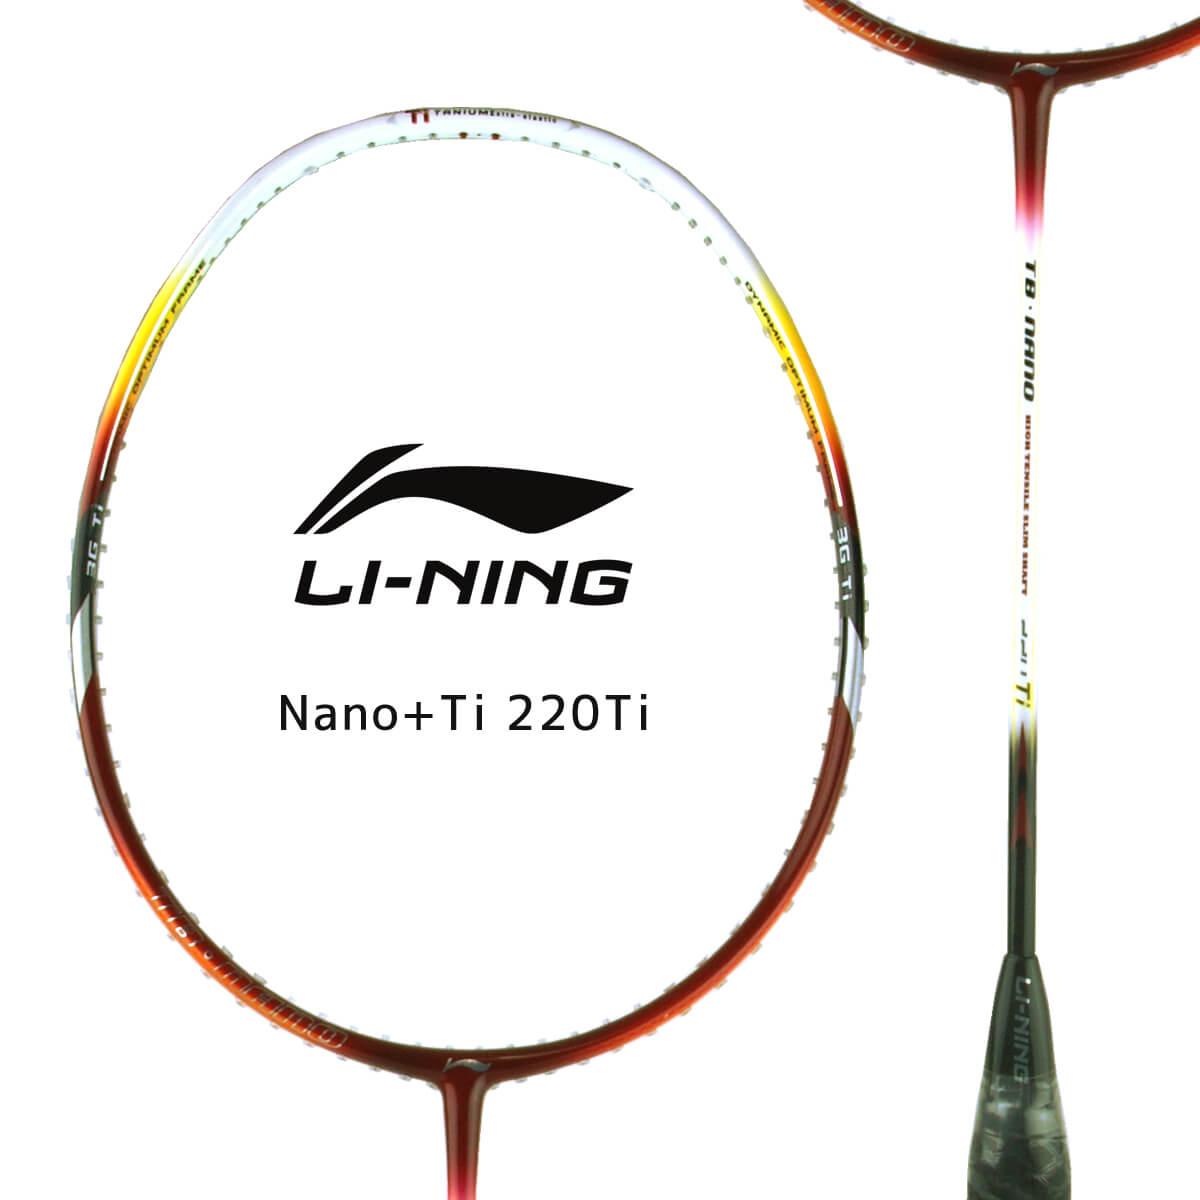 LI-NING Nano+Ti 220Ti バドミントンラケット リーニン【オススメガット&ガット張り工賃無料】